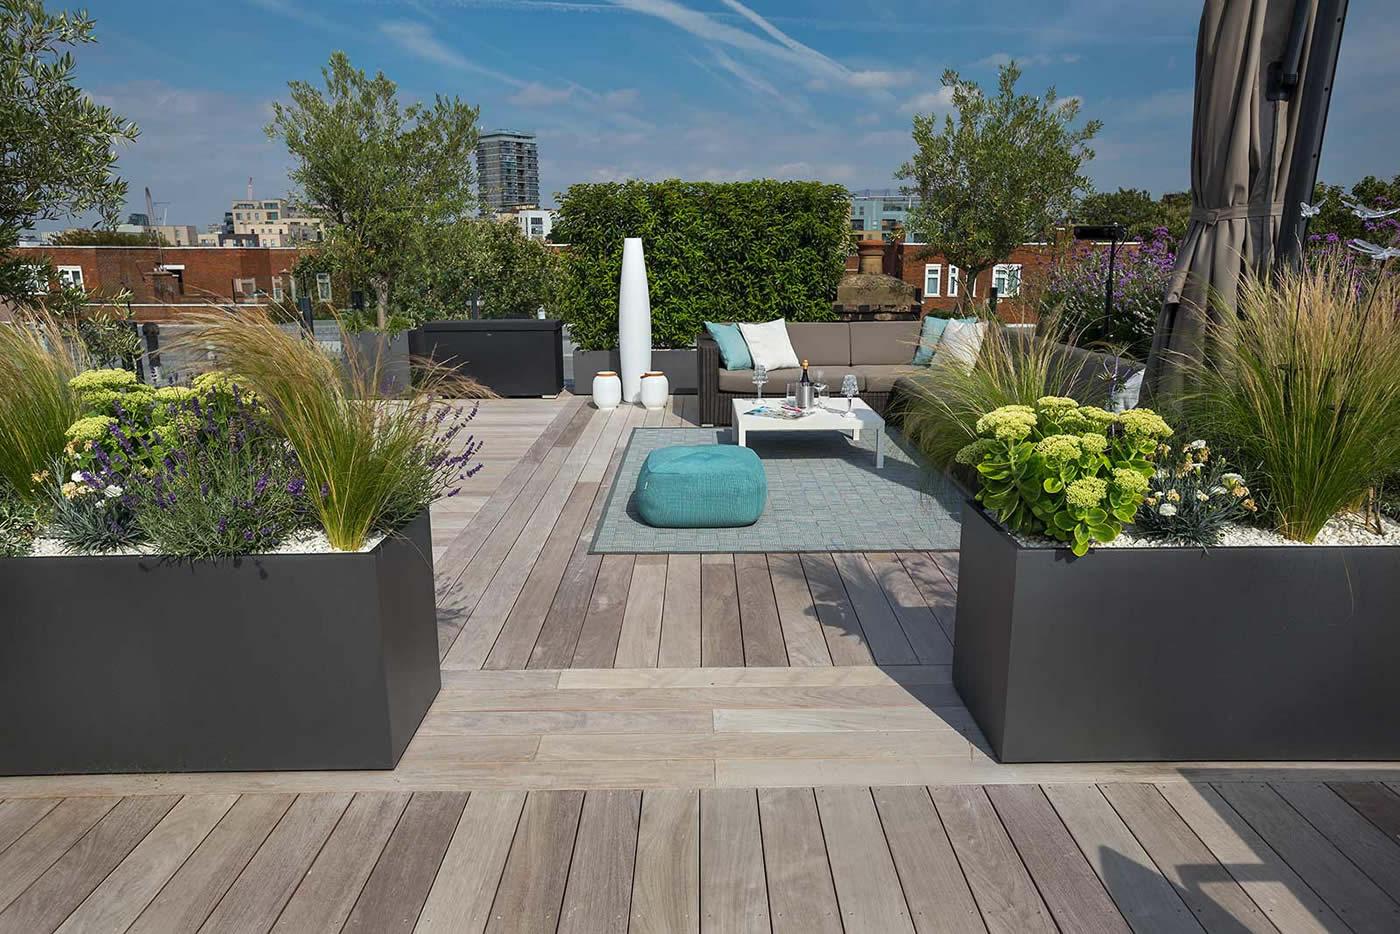 Bermondsey roof terrace Southwark in South London